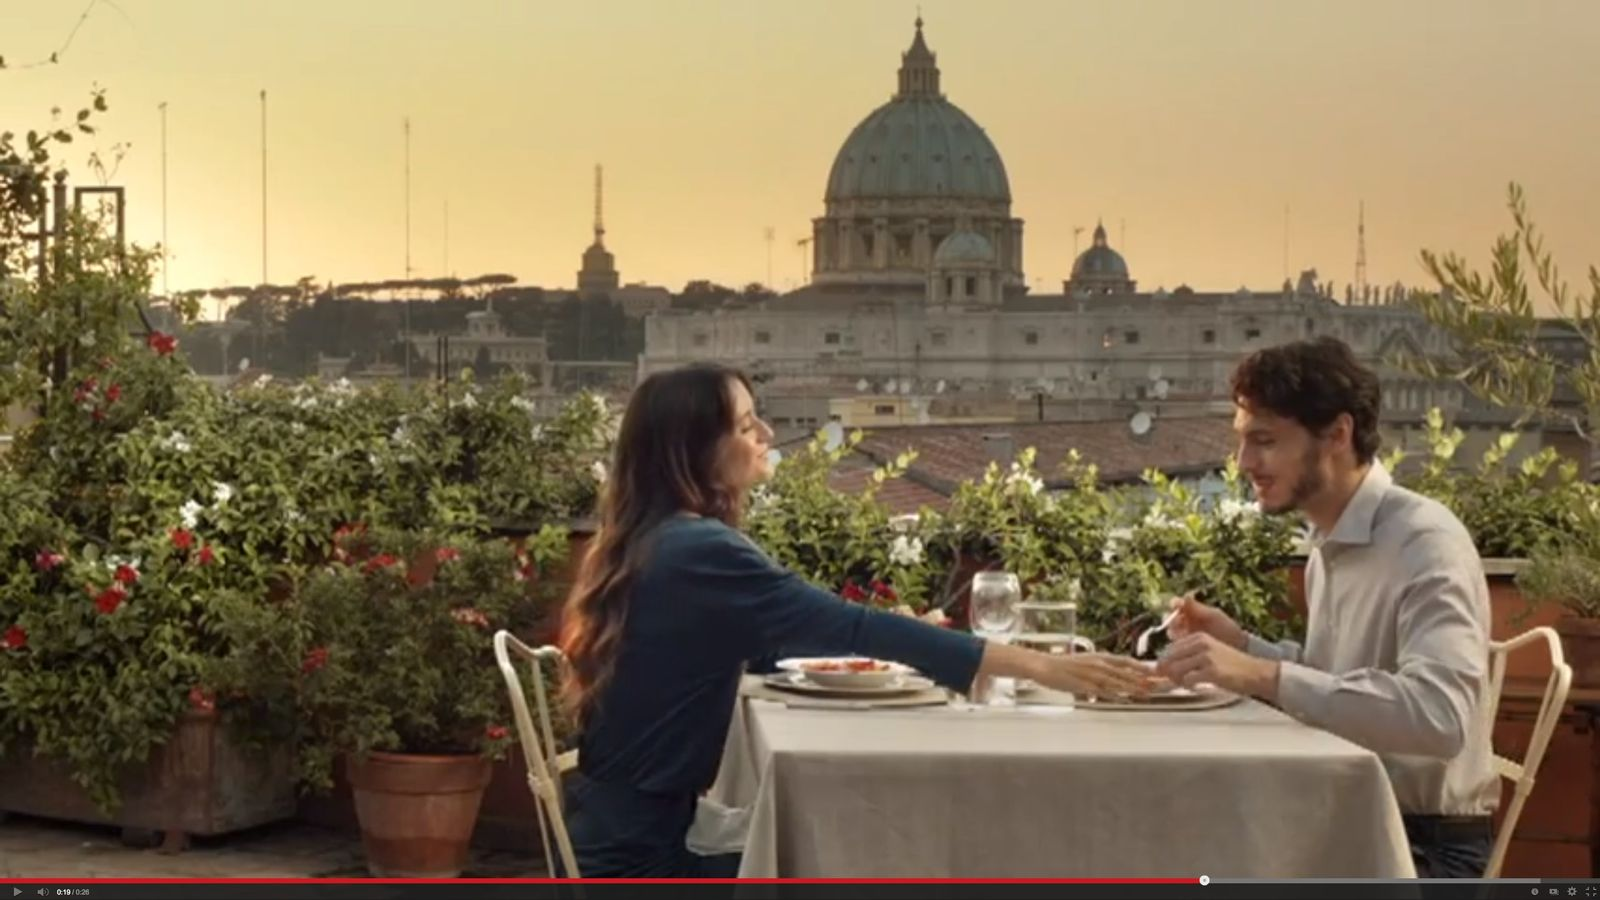 NUR ALS ZITAT TV Spot Barilla Pasta und Sauce